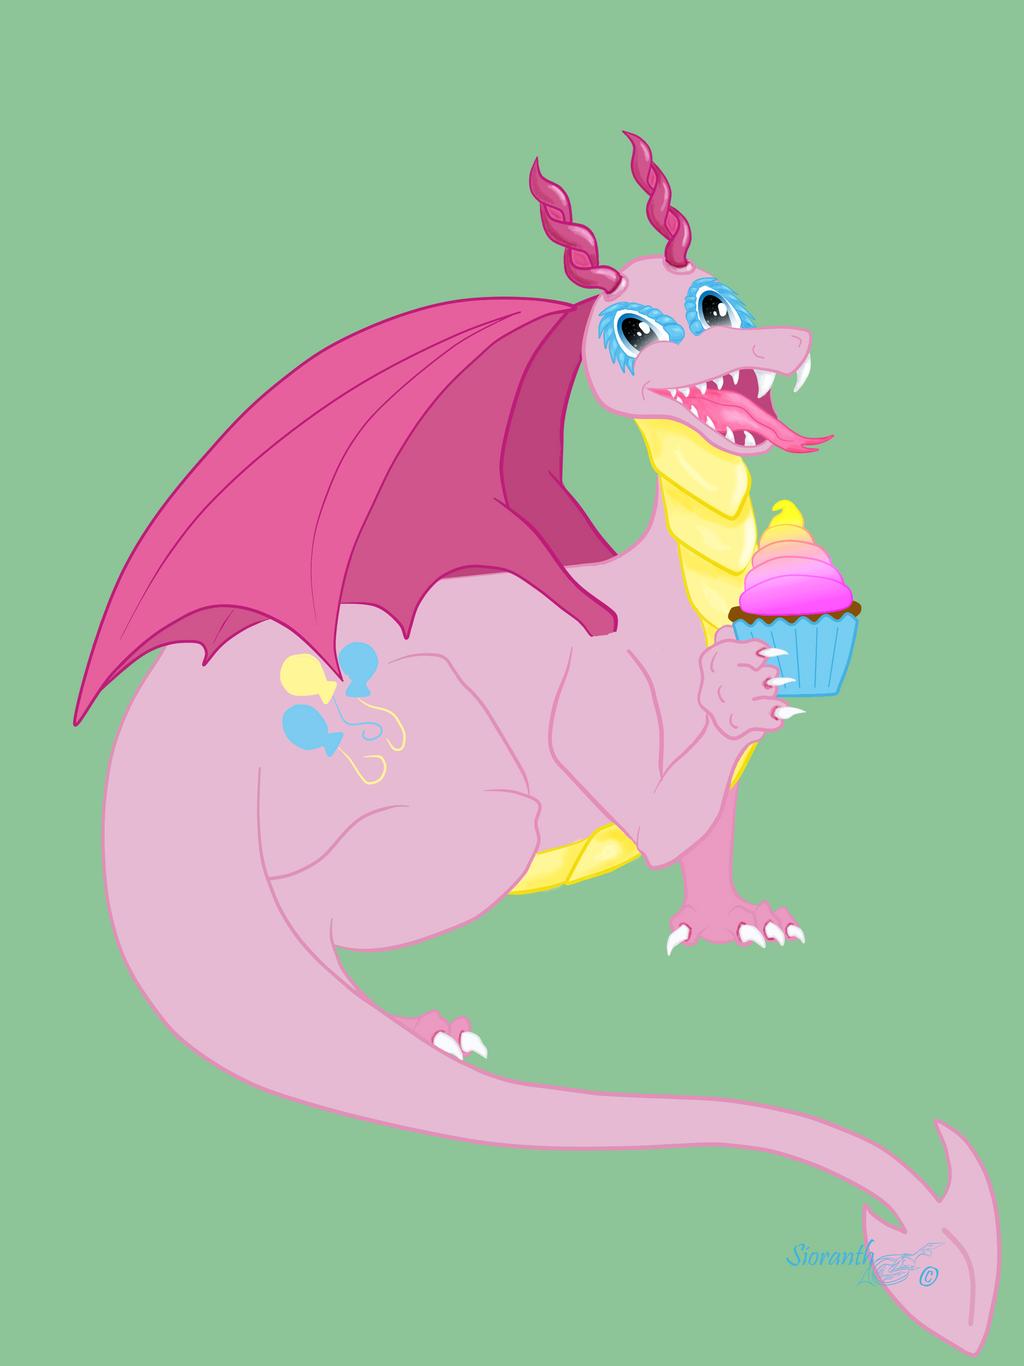 MLP Dragon Pinkie Pie WIP by sioranth